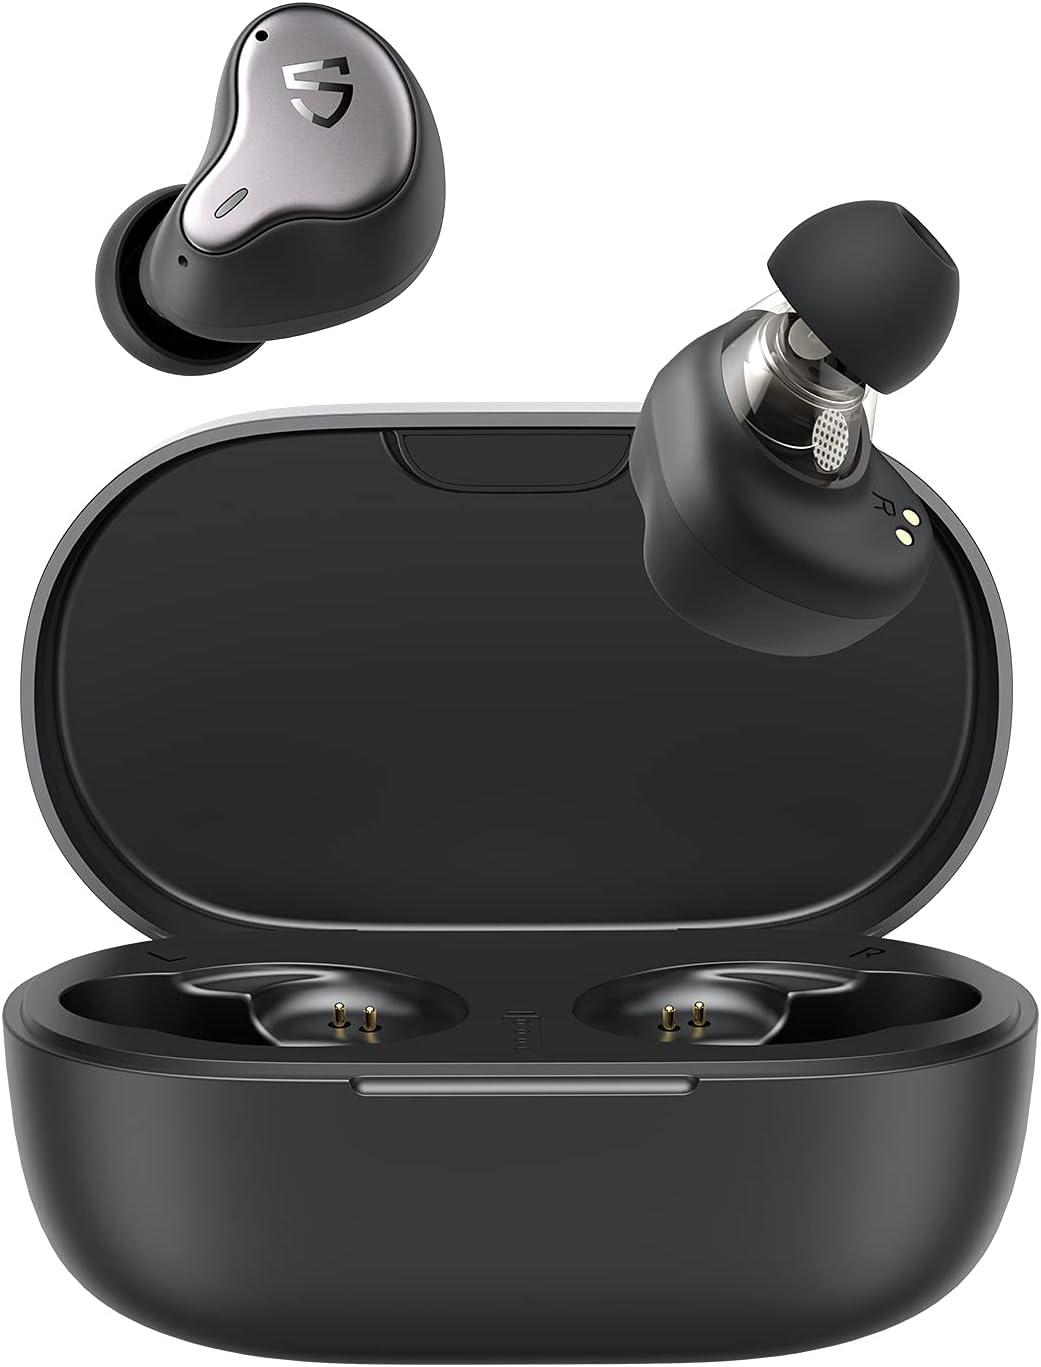 SoundPEATS H1 Hybrid Dual Driver Wireless Earbuds, Bluetooth 5.2 Stereo Headphones with Immersive Sound, aptX Adaptive, Low Latency Game Mode, TrueWireless Mirroring, 4-Mic, CVC 8.0